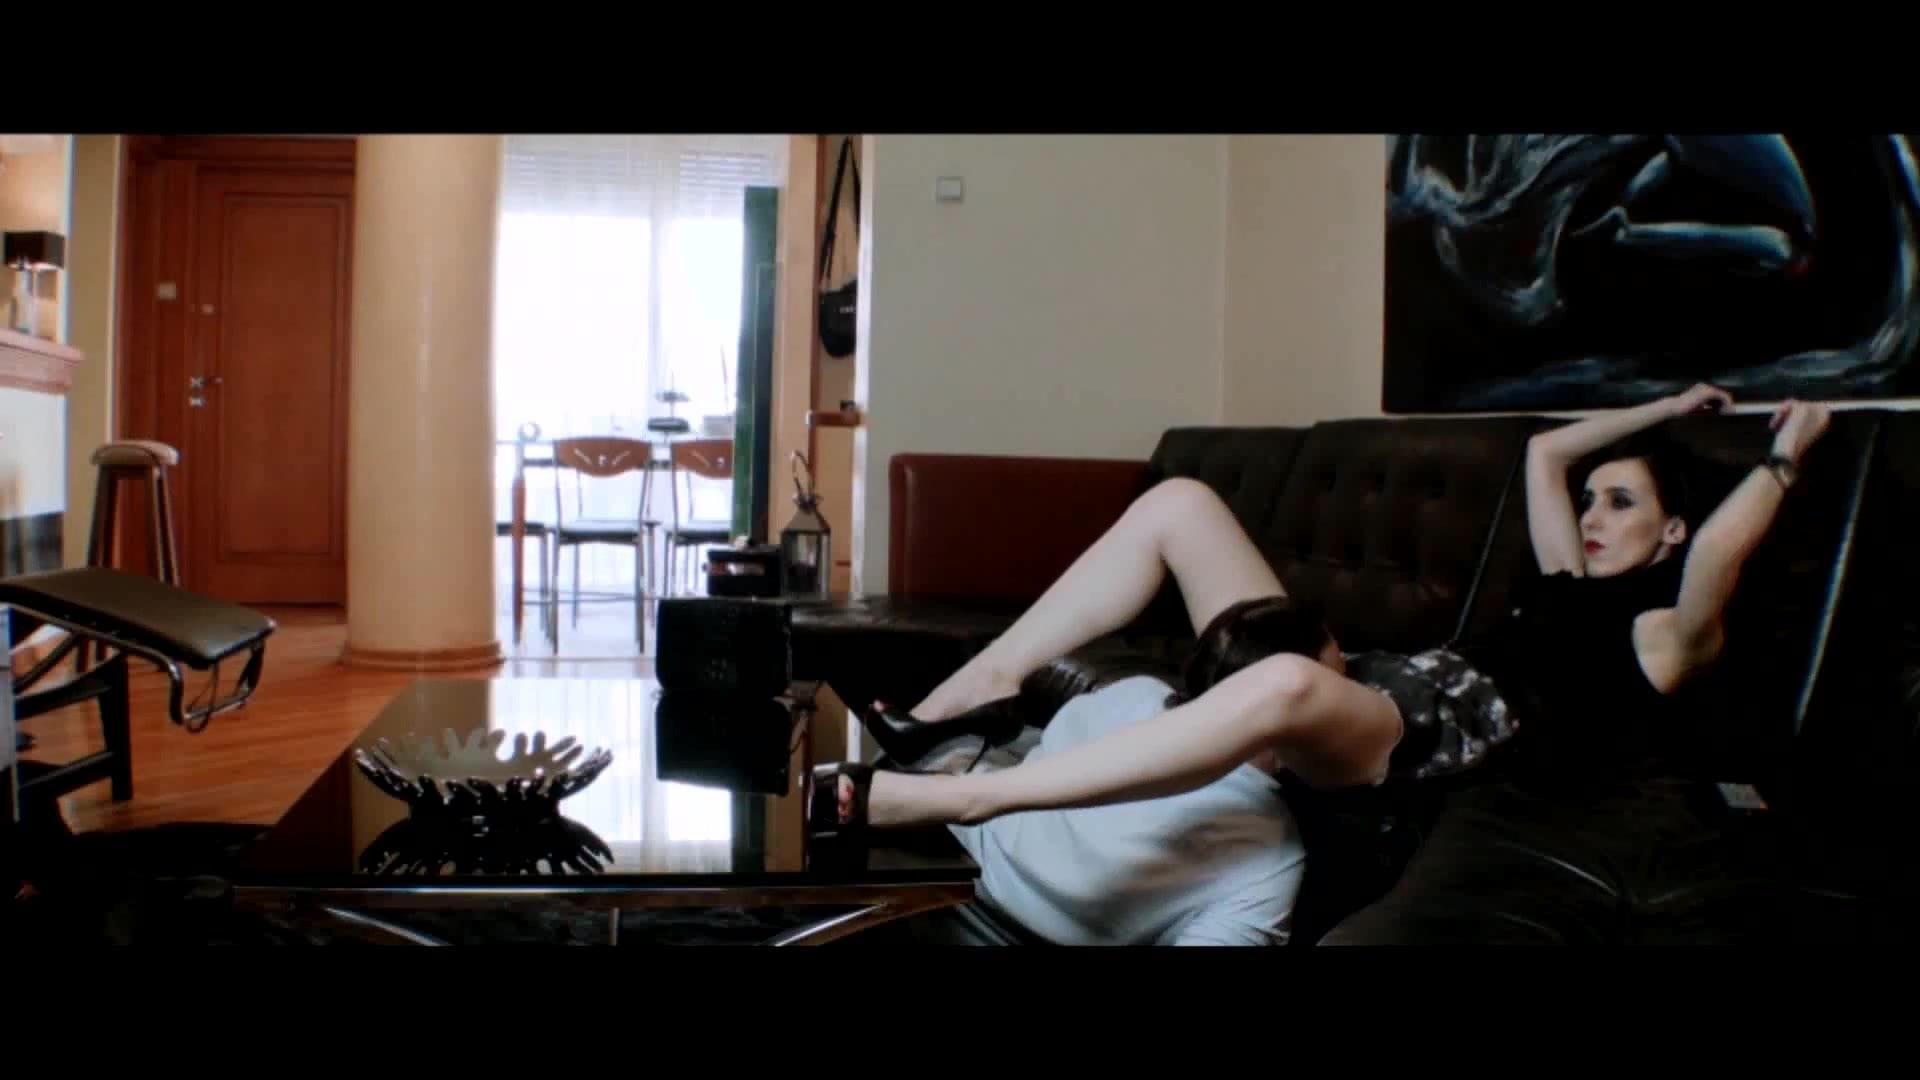 The Mistress Girl Masturbating Tits Mistresses Mobileporn